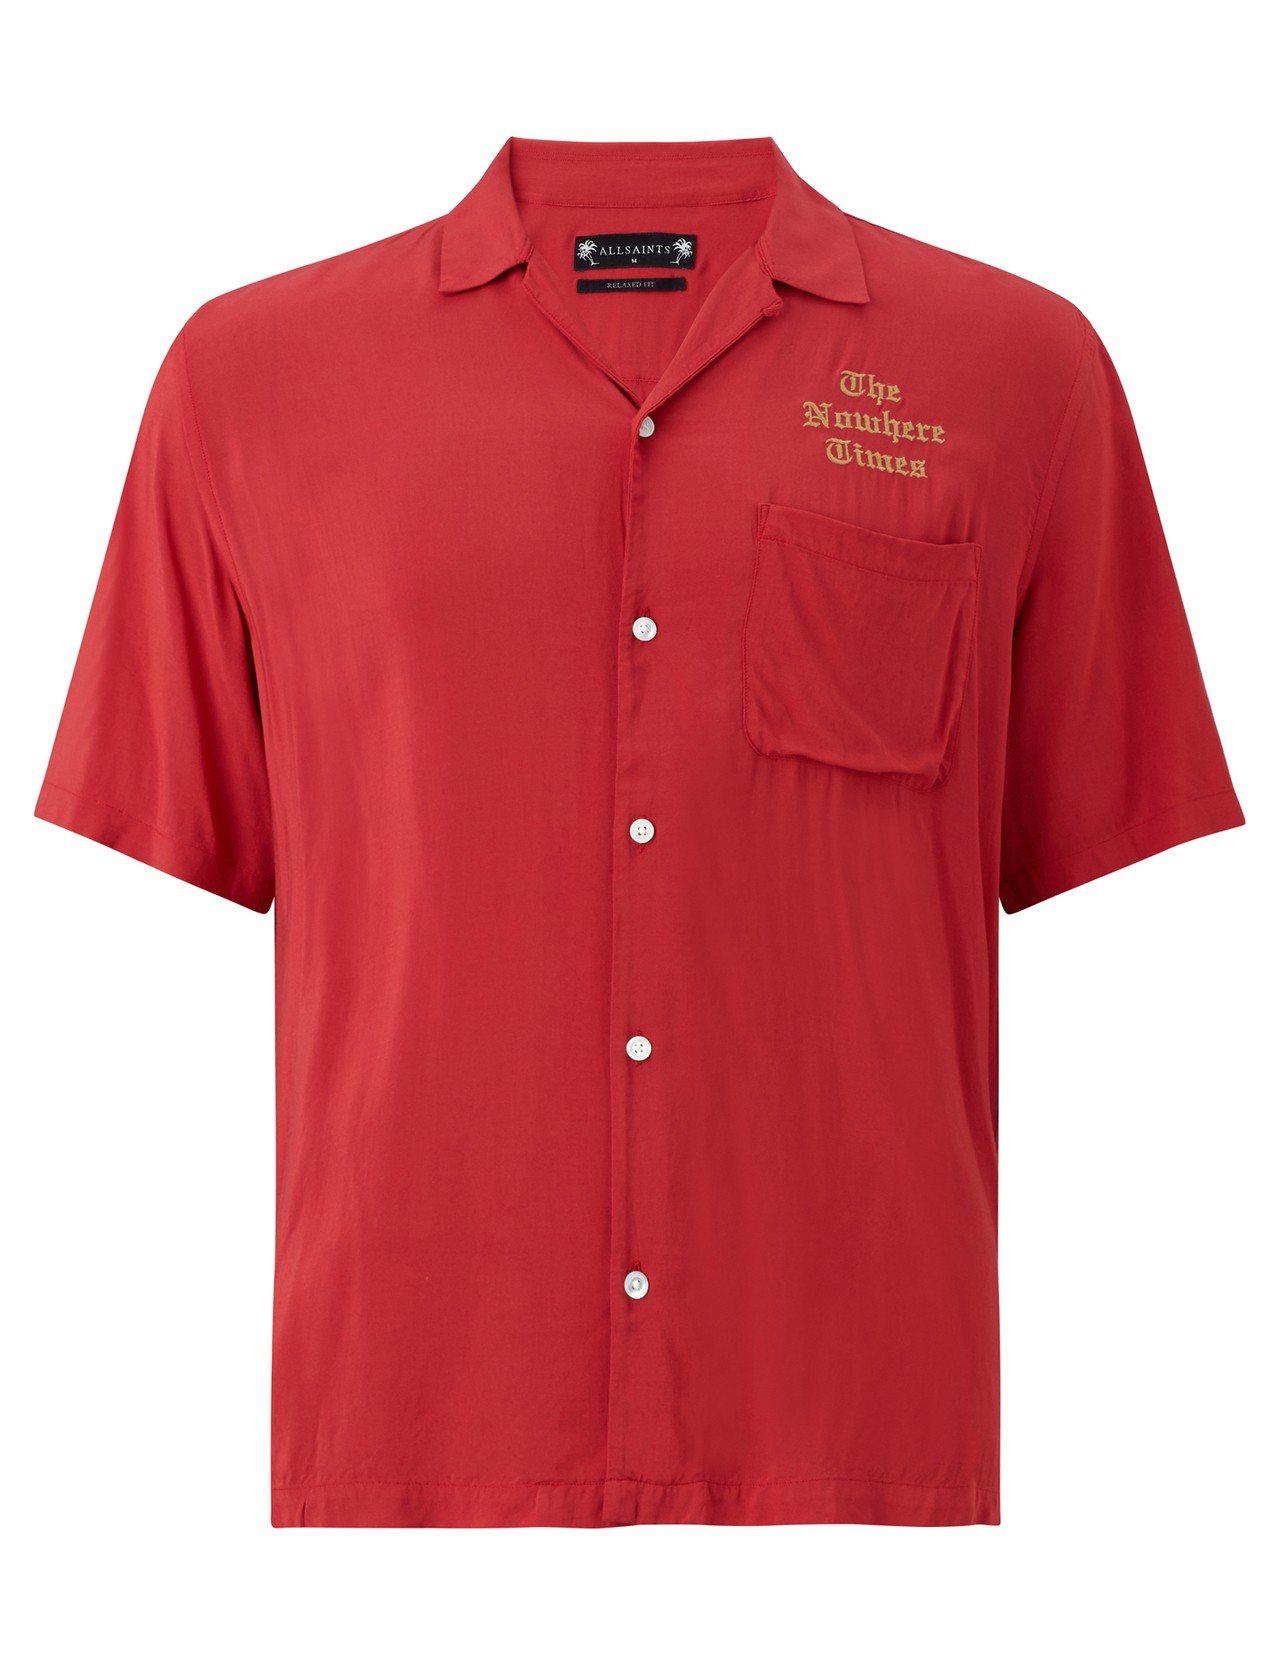 AllSaints Oblivion紅色刺繡襯衫,價格店洽。圖/AllSaint...